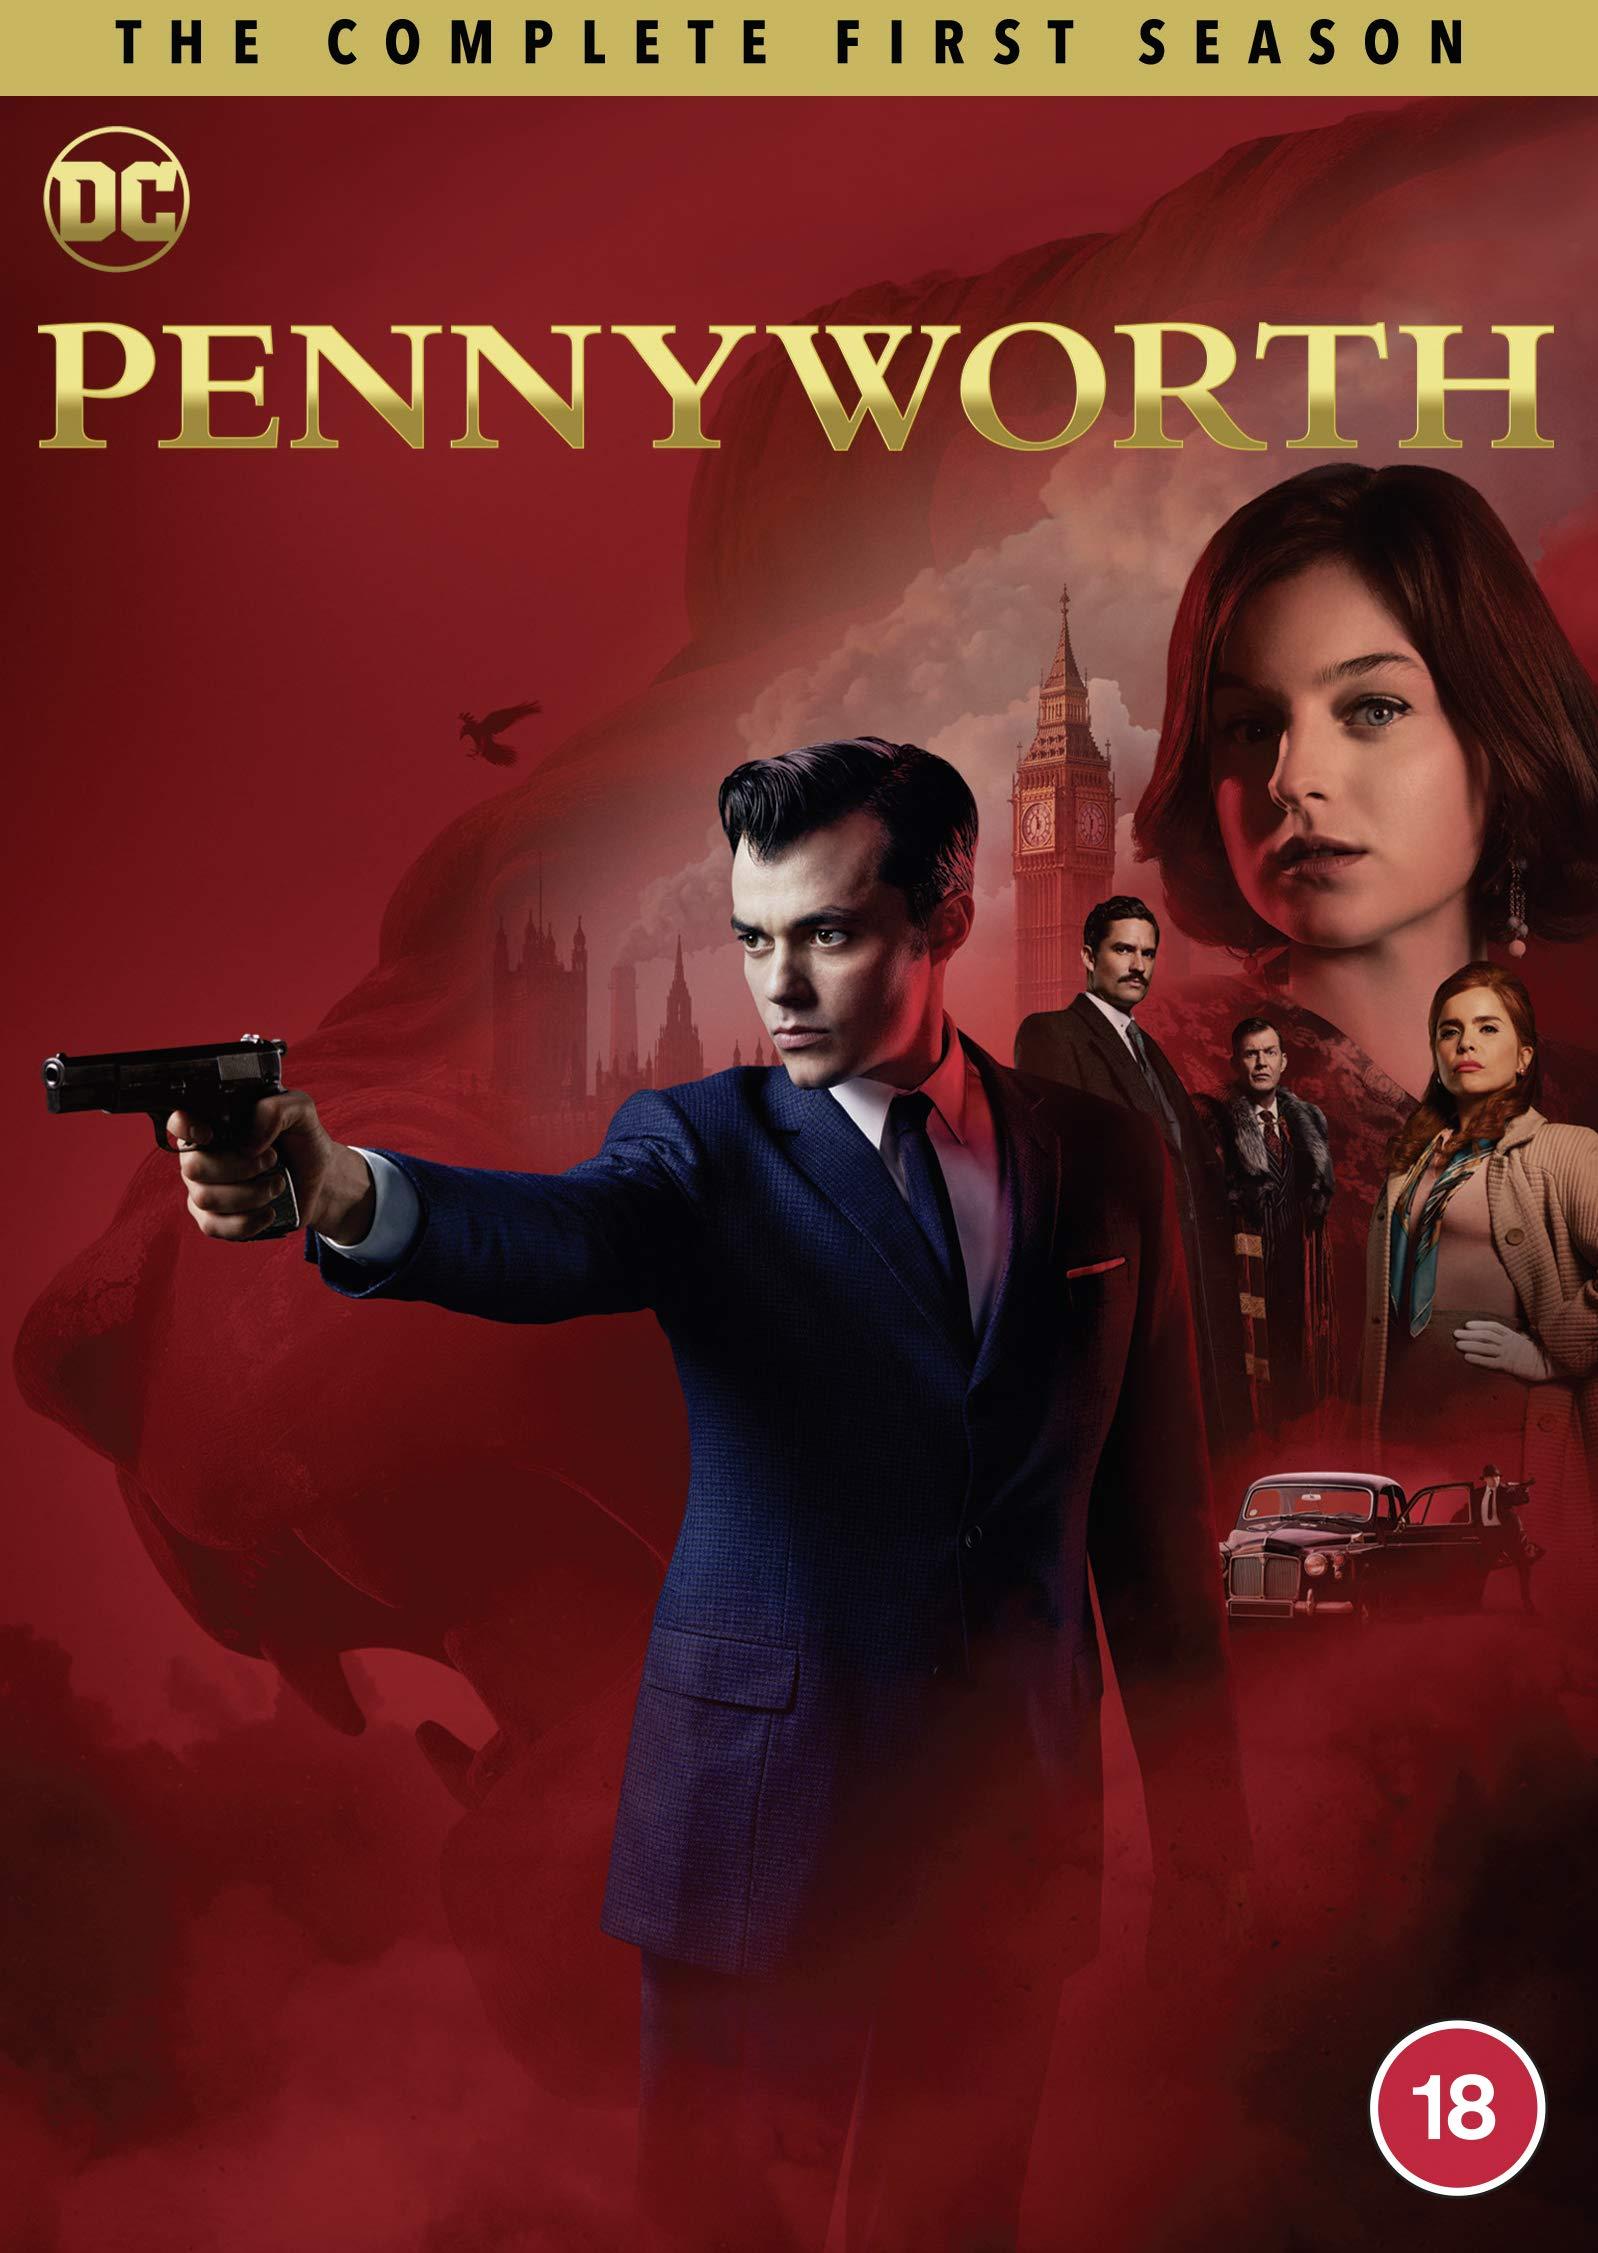 Pennyworth Season 1 Dvd 2019 2020 Buy Online In Mongolia At Mongolia Desertcart Com Productid 206795049